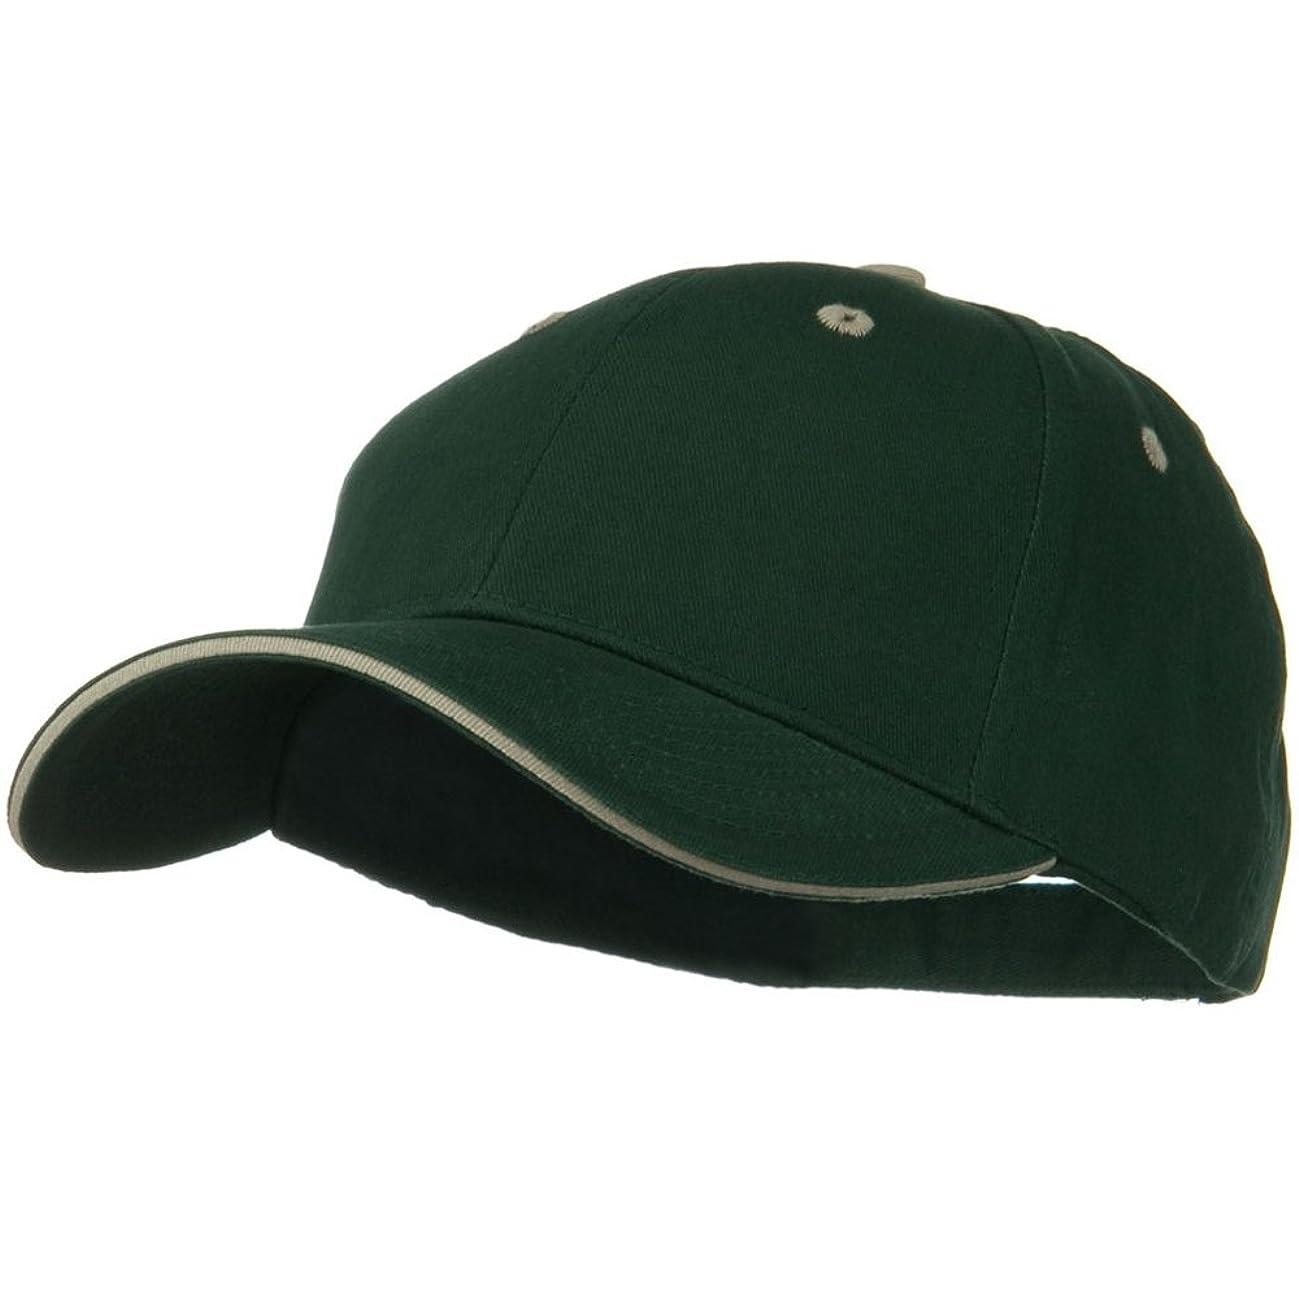 OTTO Solid Brushed Twill Sandwich Visor Cap - Dark Green Khaki